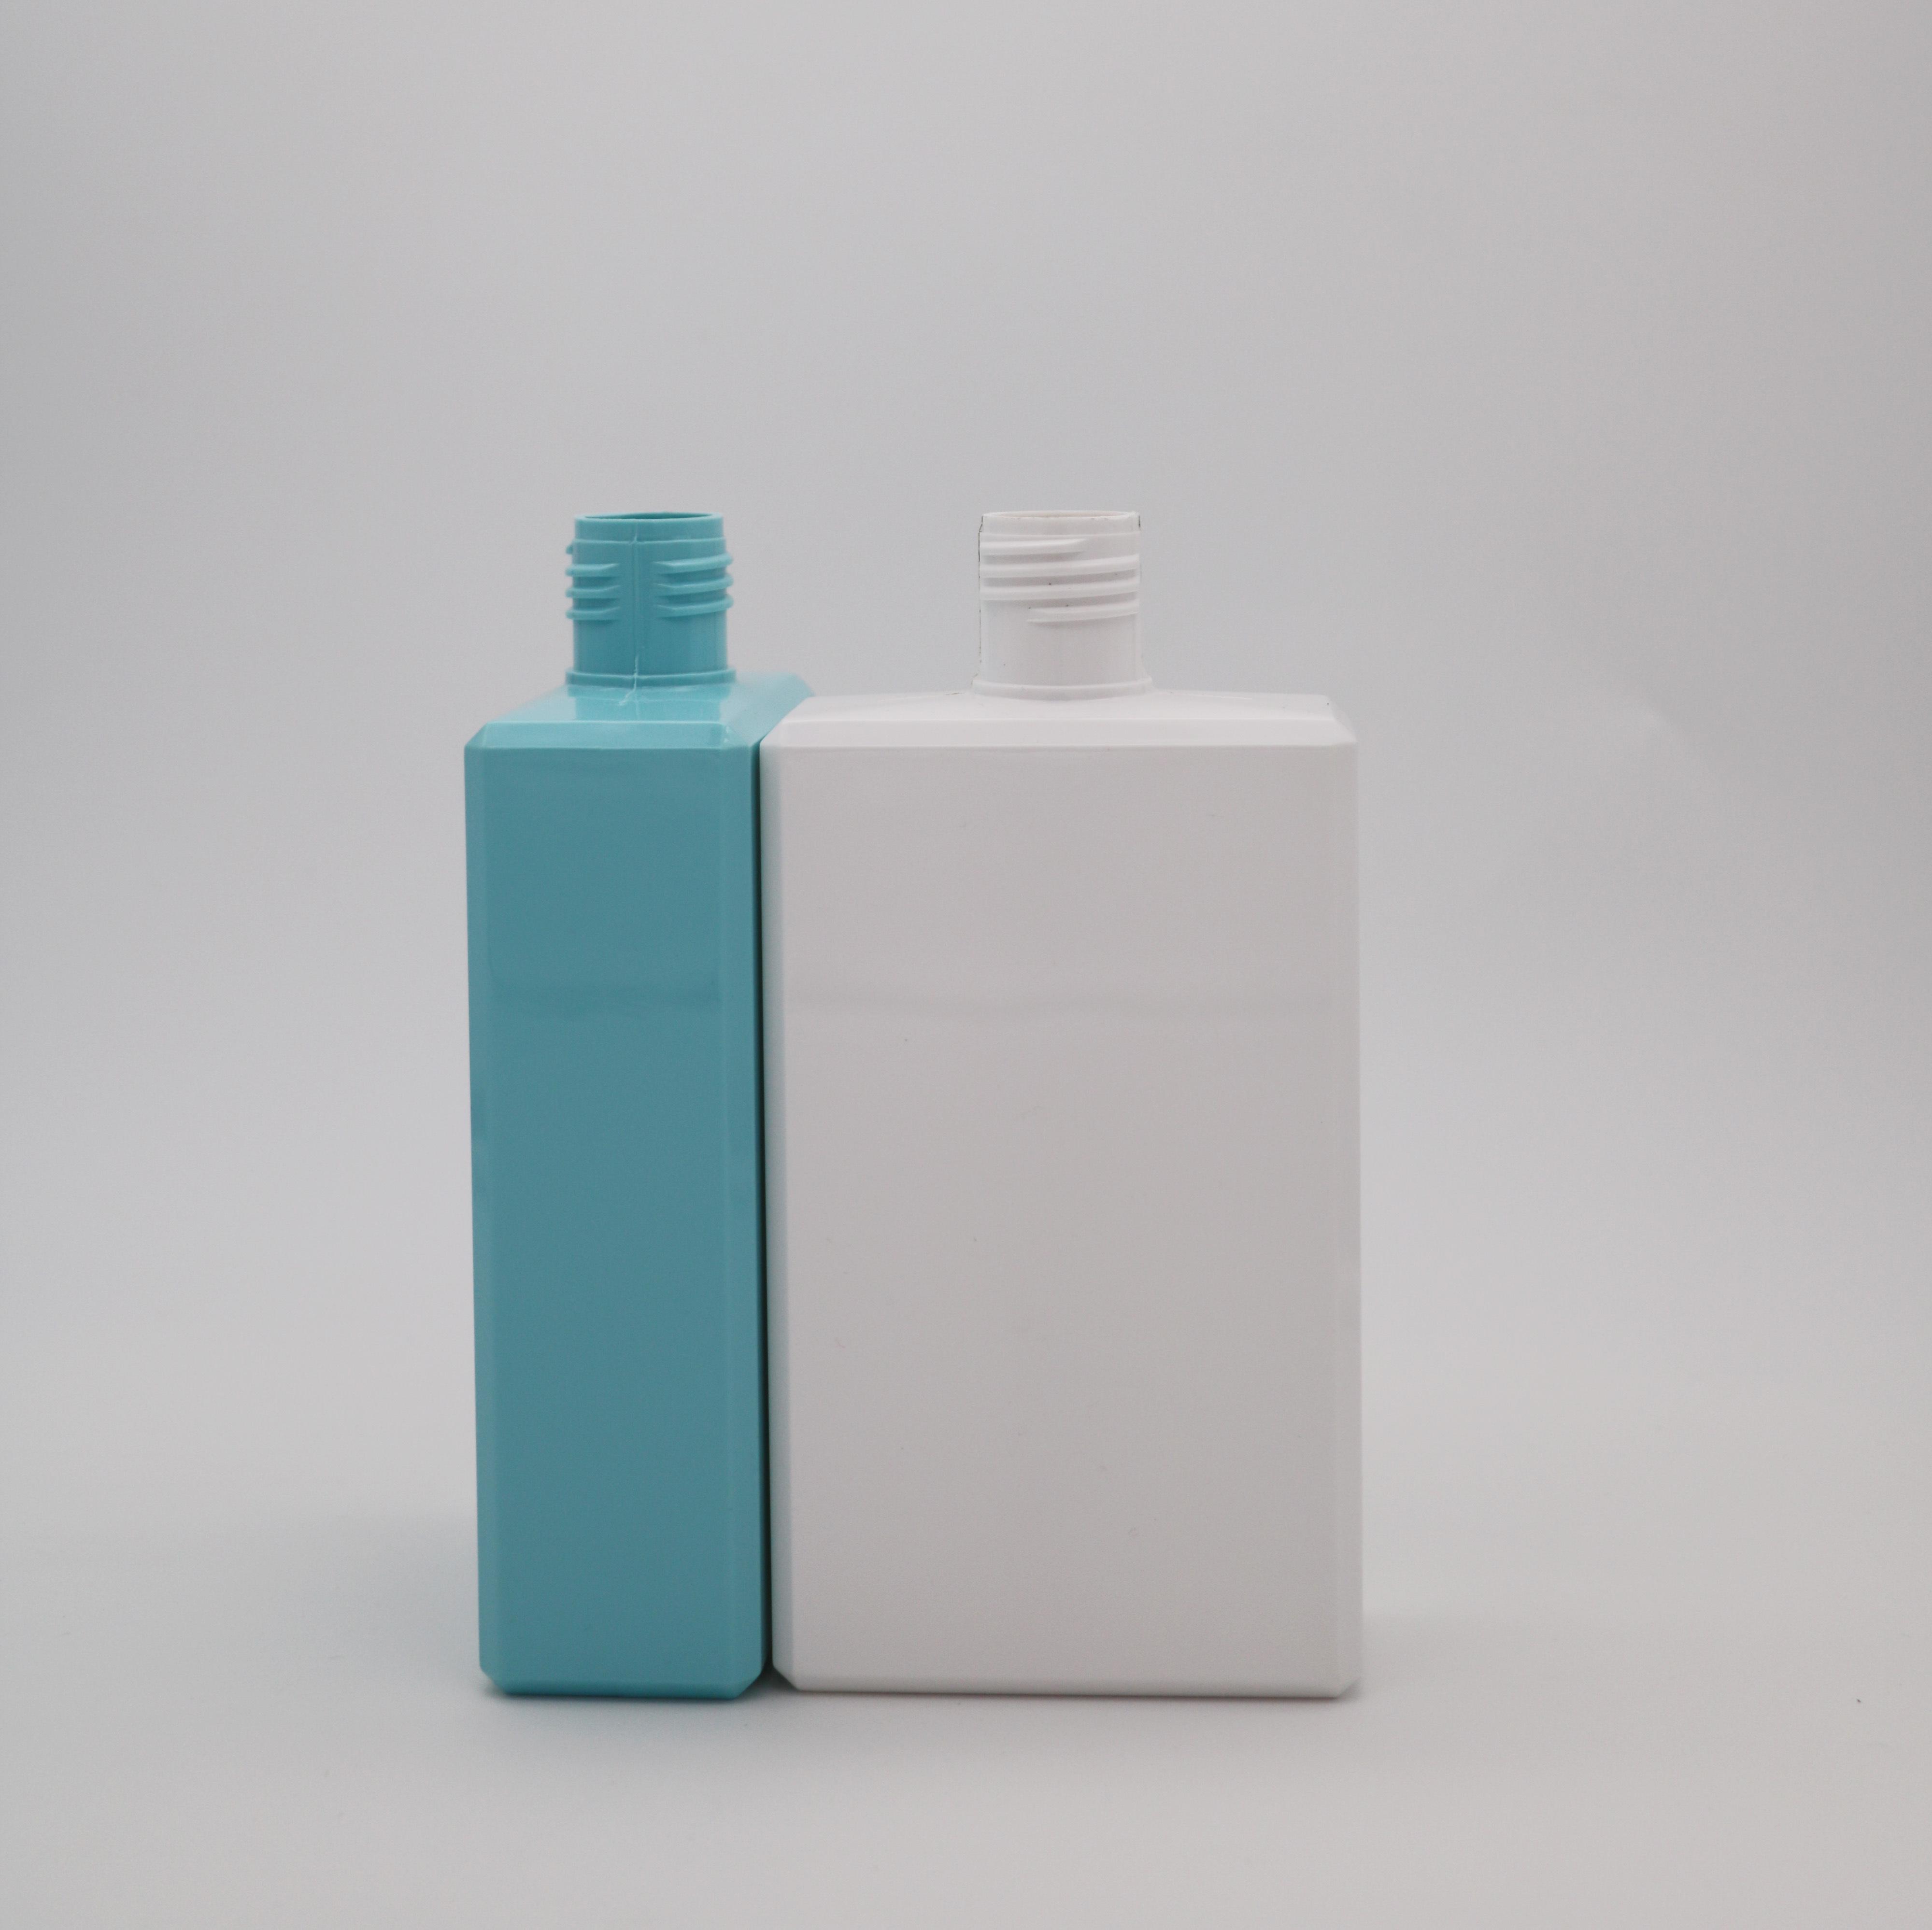 250 ml square Lotion/Shampoo/Conditioner Bottle